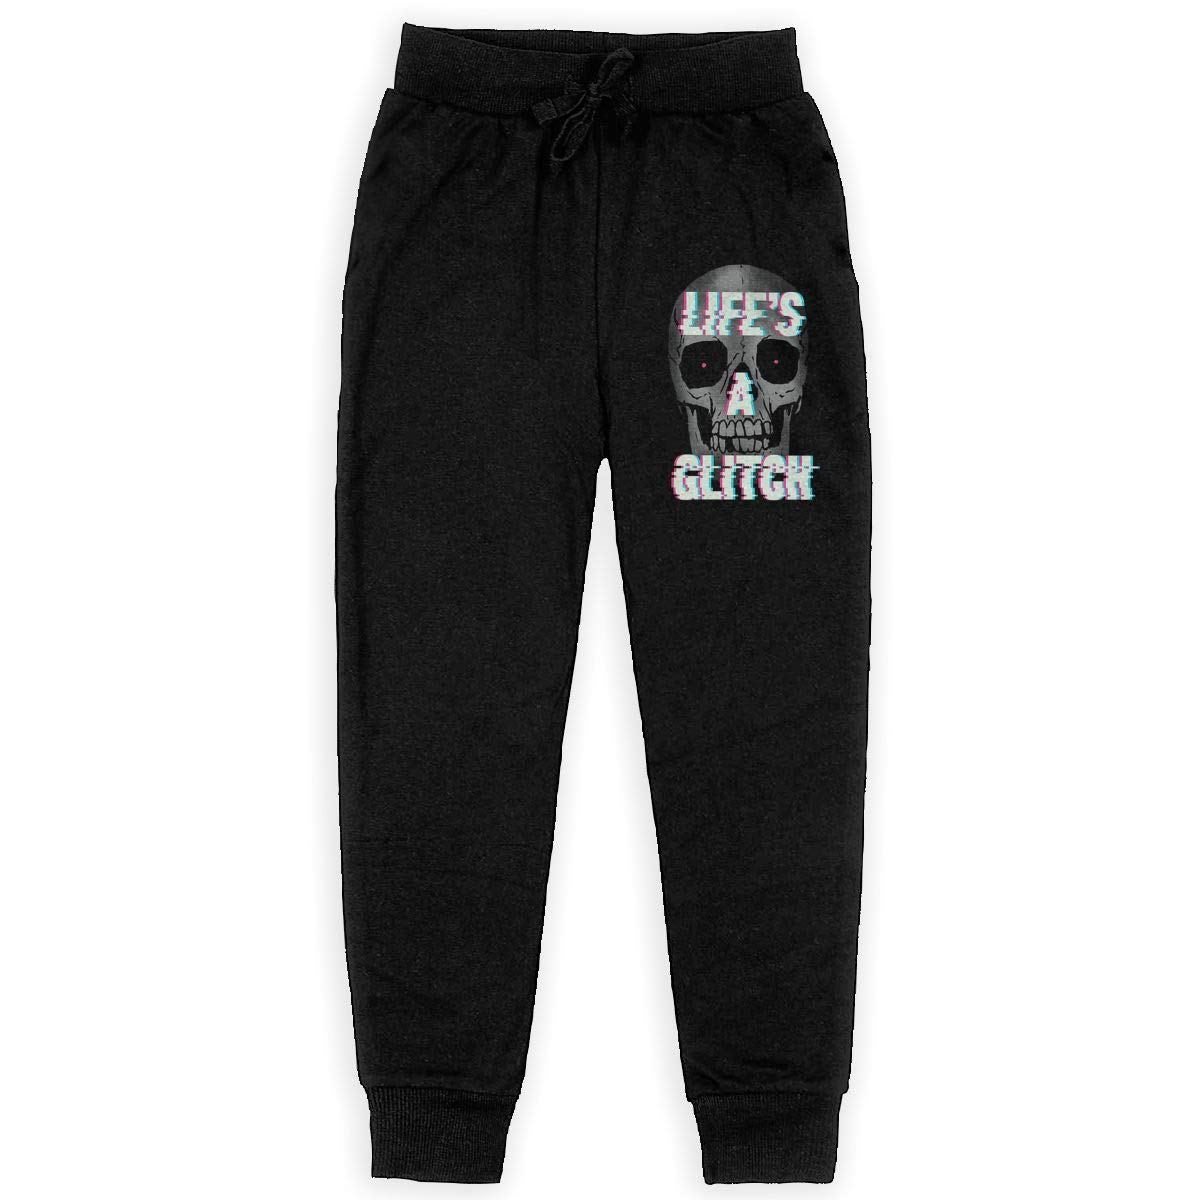 Kim Mittelstaedt Lifes Glitch Boys Big Active Basic Casual Pants Sweatpants for Boys Black